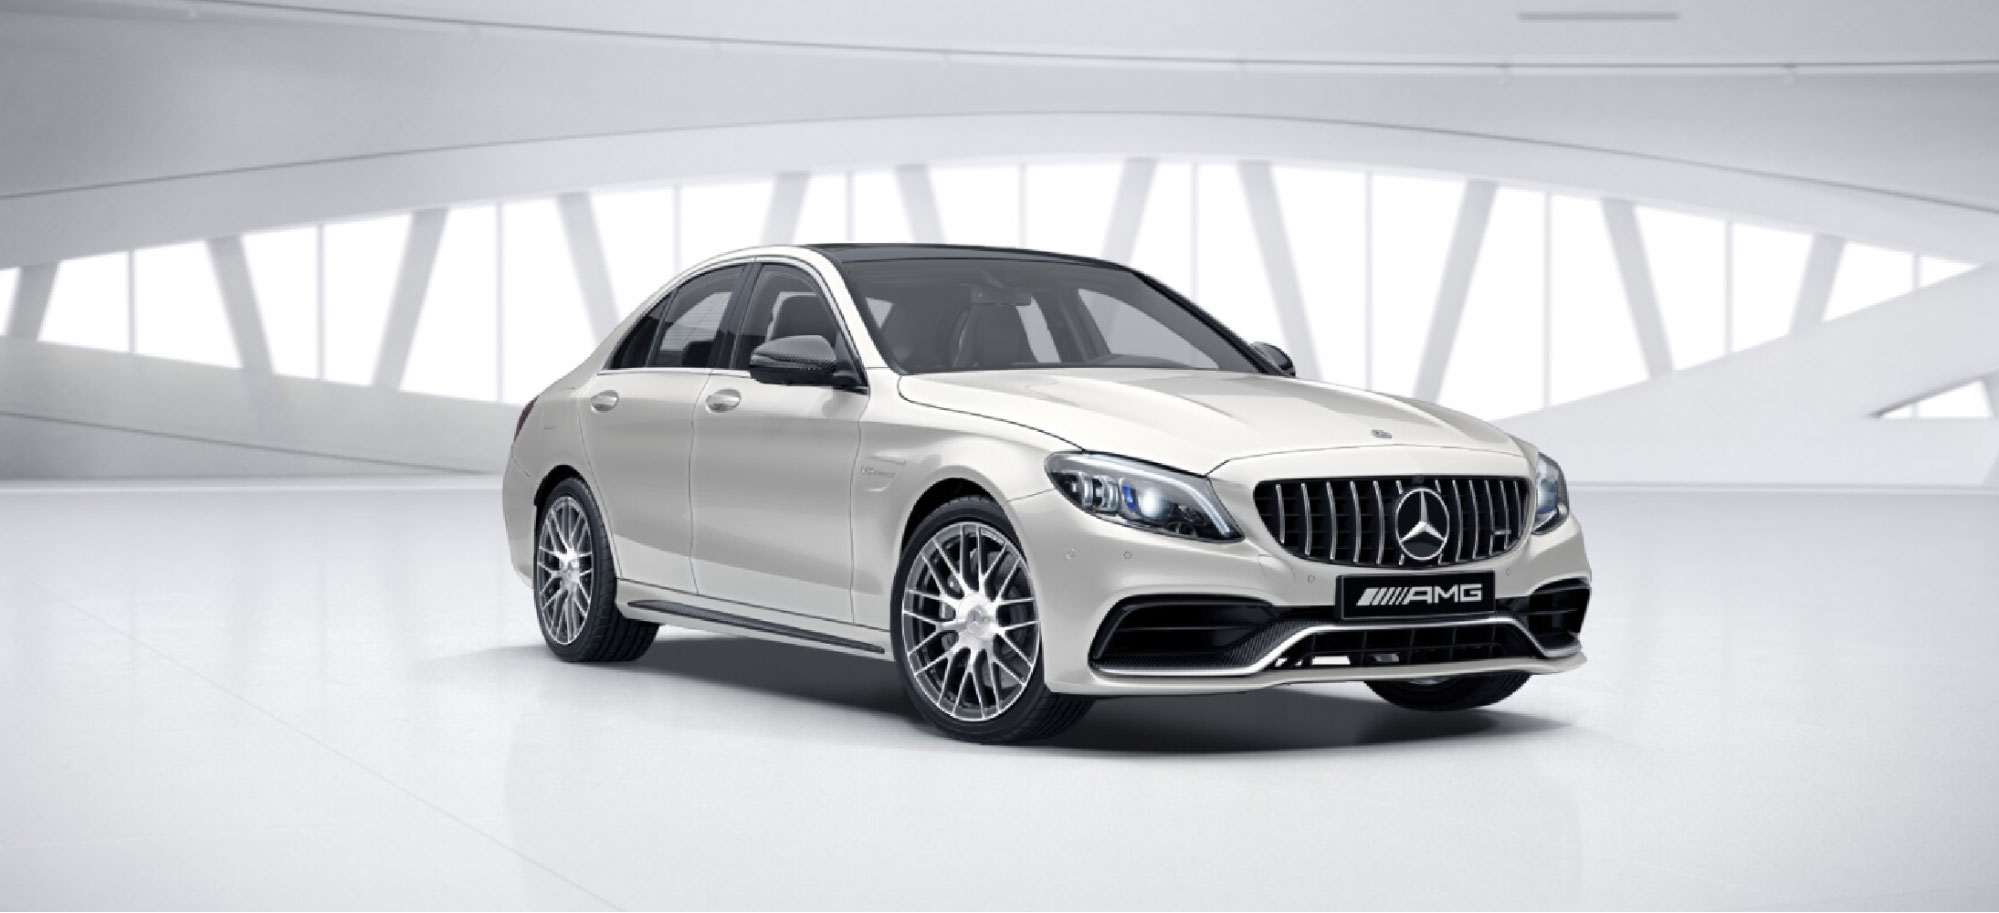 Mercedes-AMG C63 0952611176